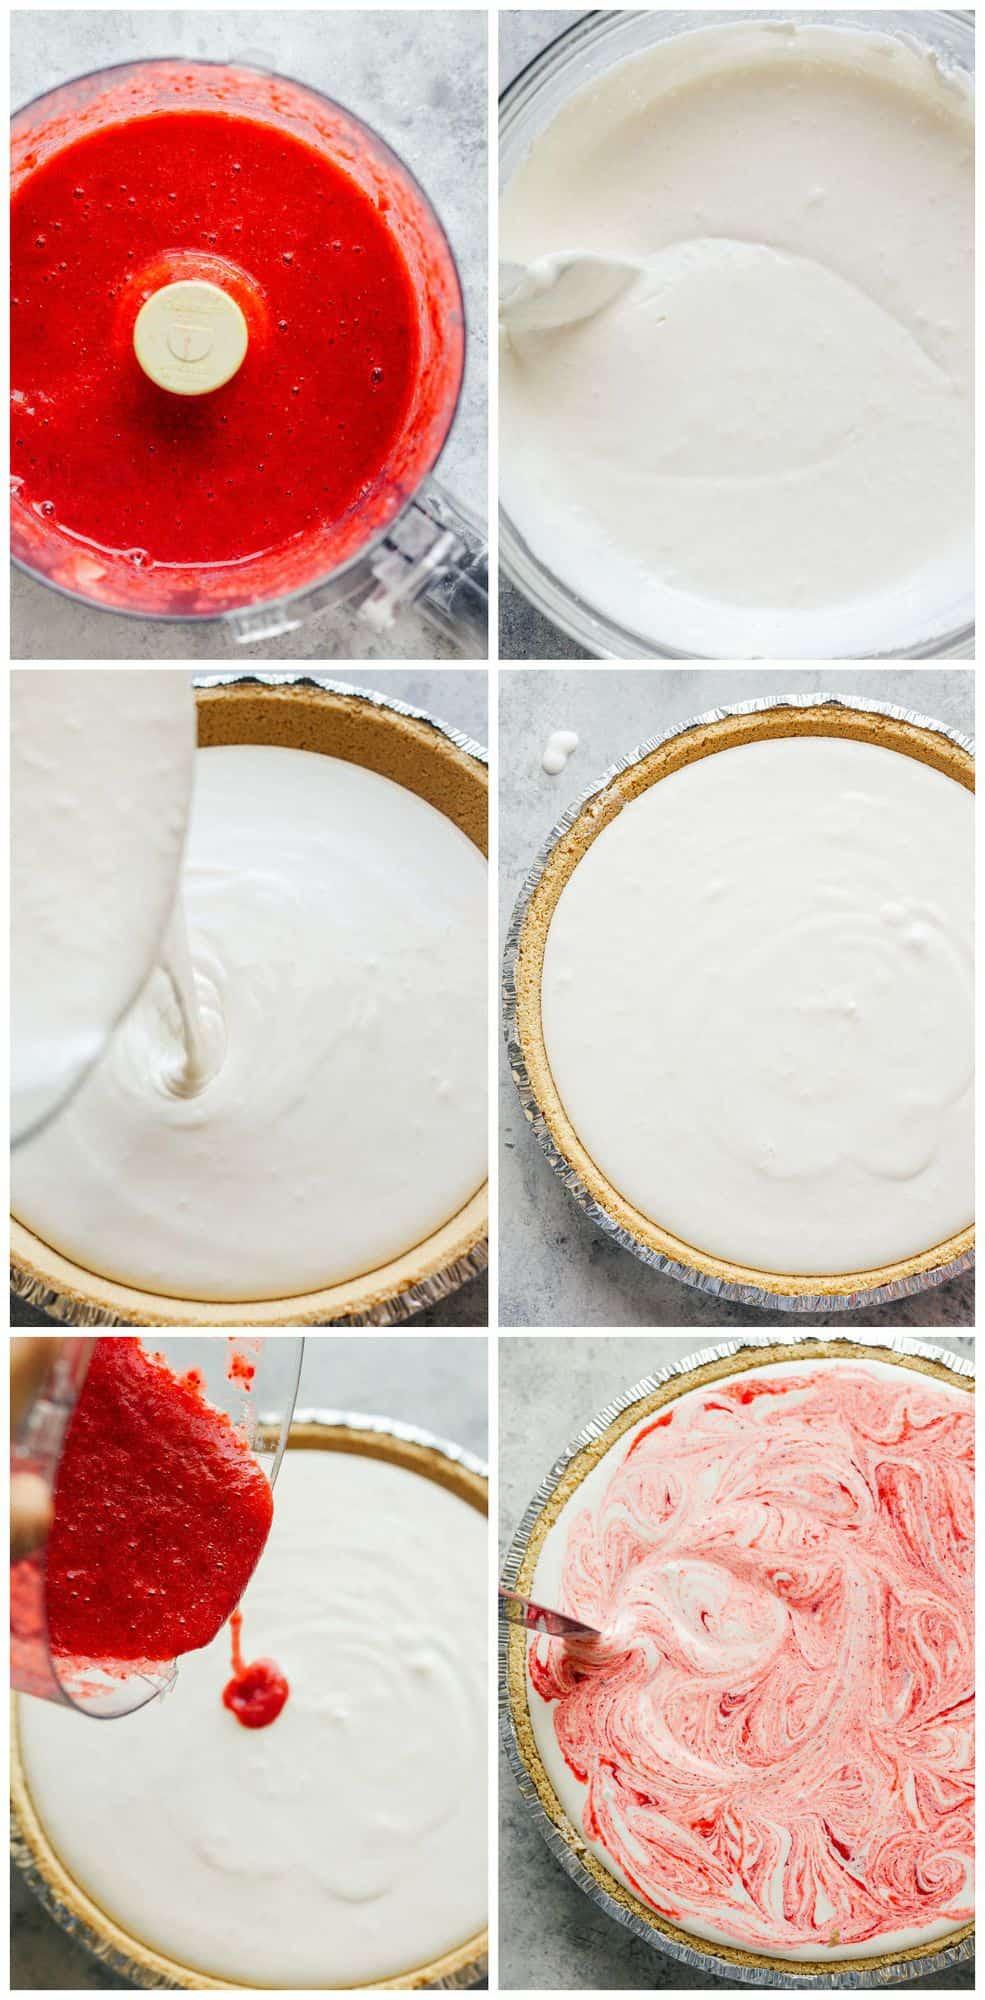 step by step photos for how to make strawberry lemonade pie